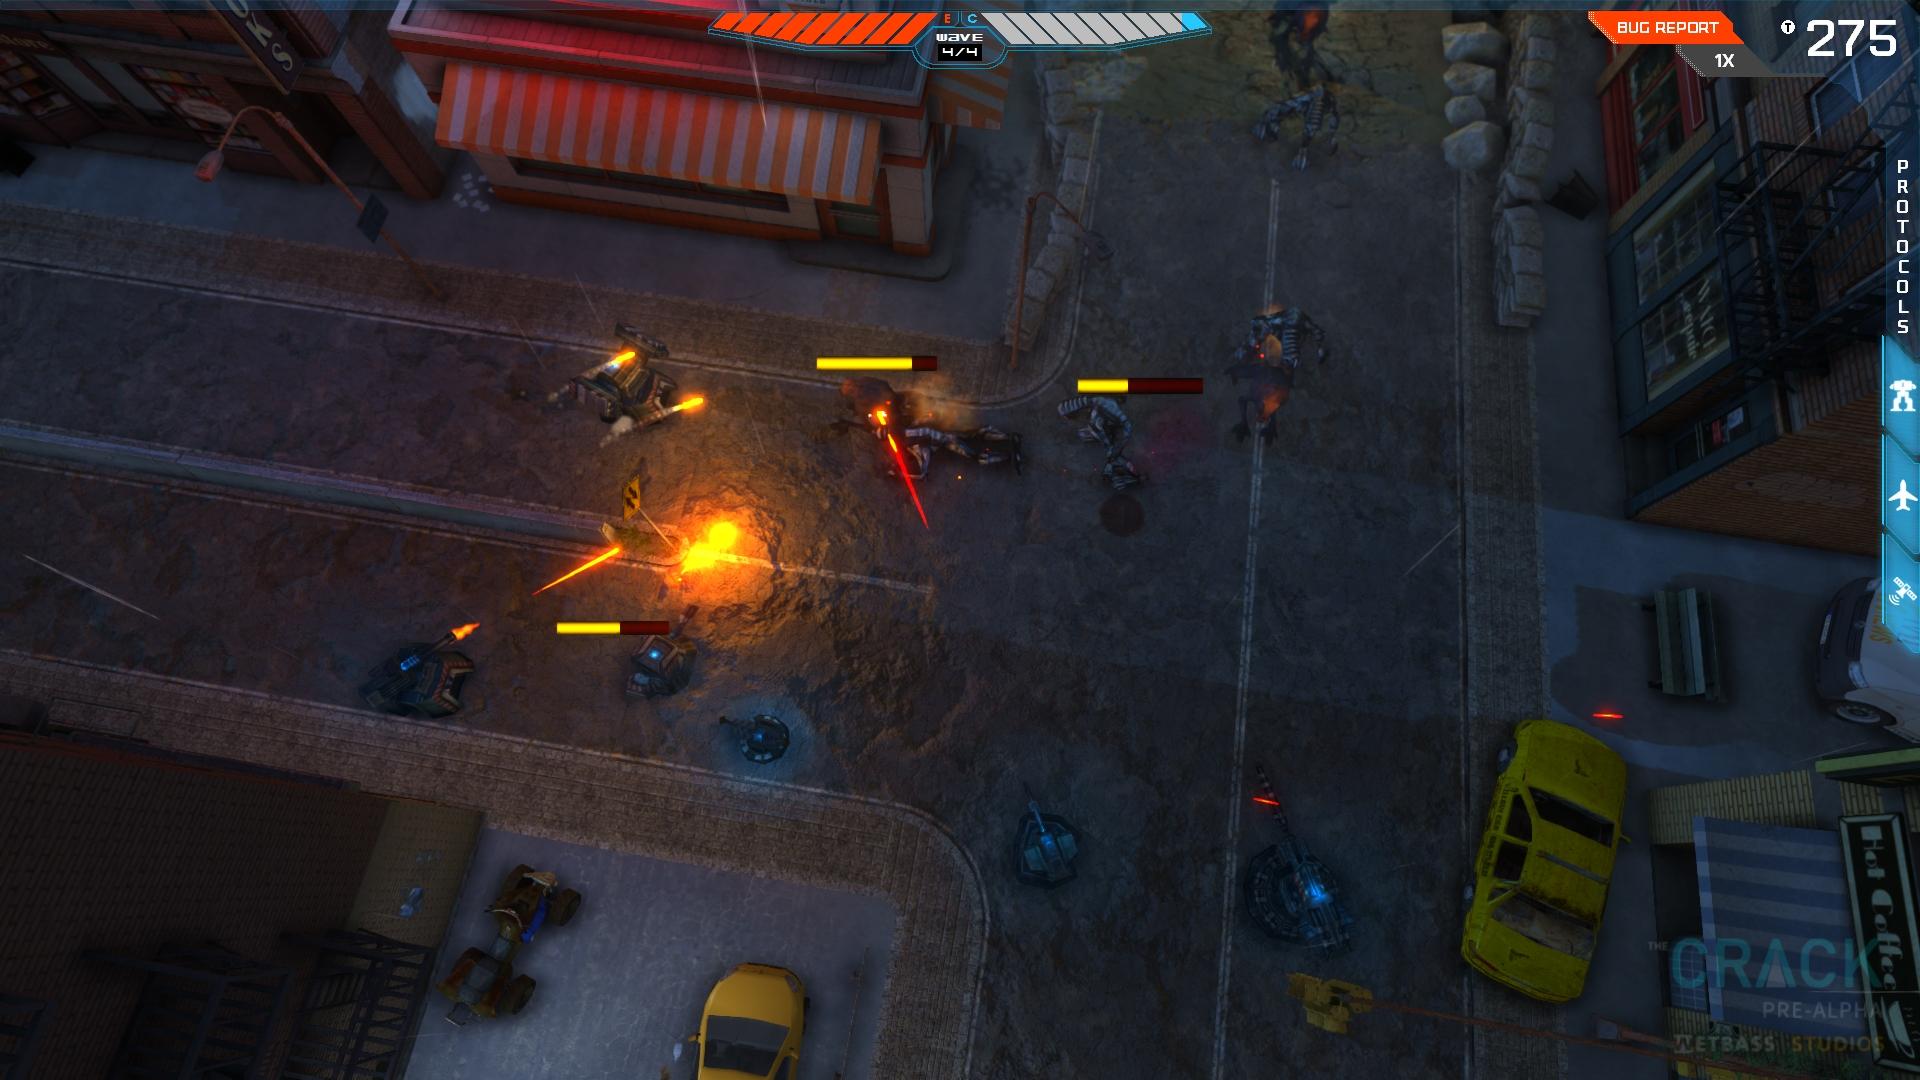 Powermta Linux Cracked Games - freedomdotigd